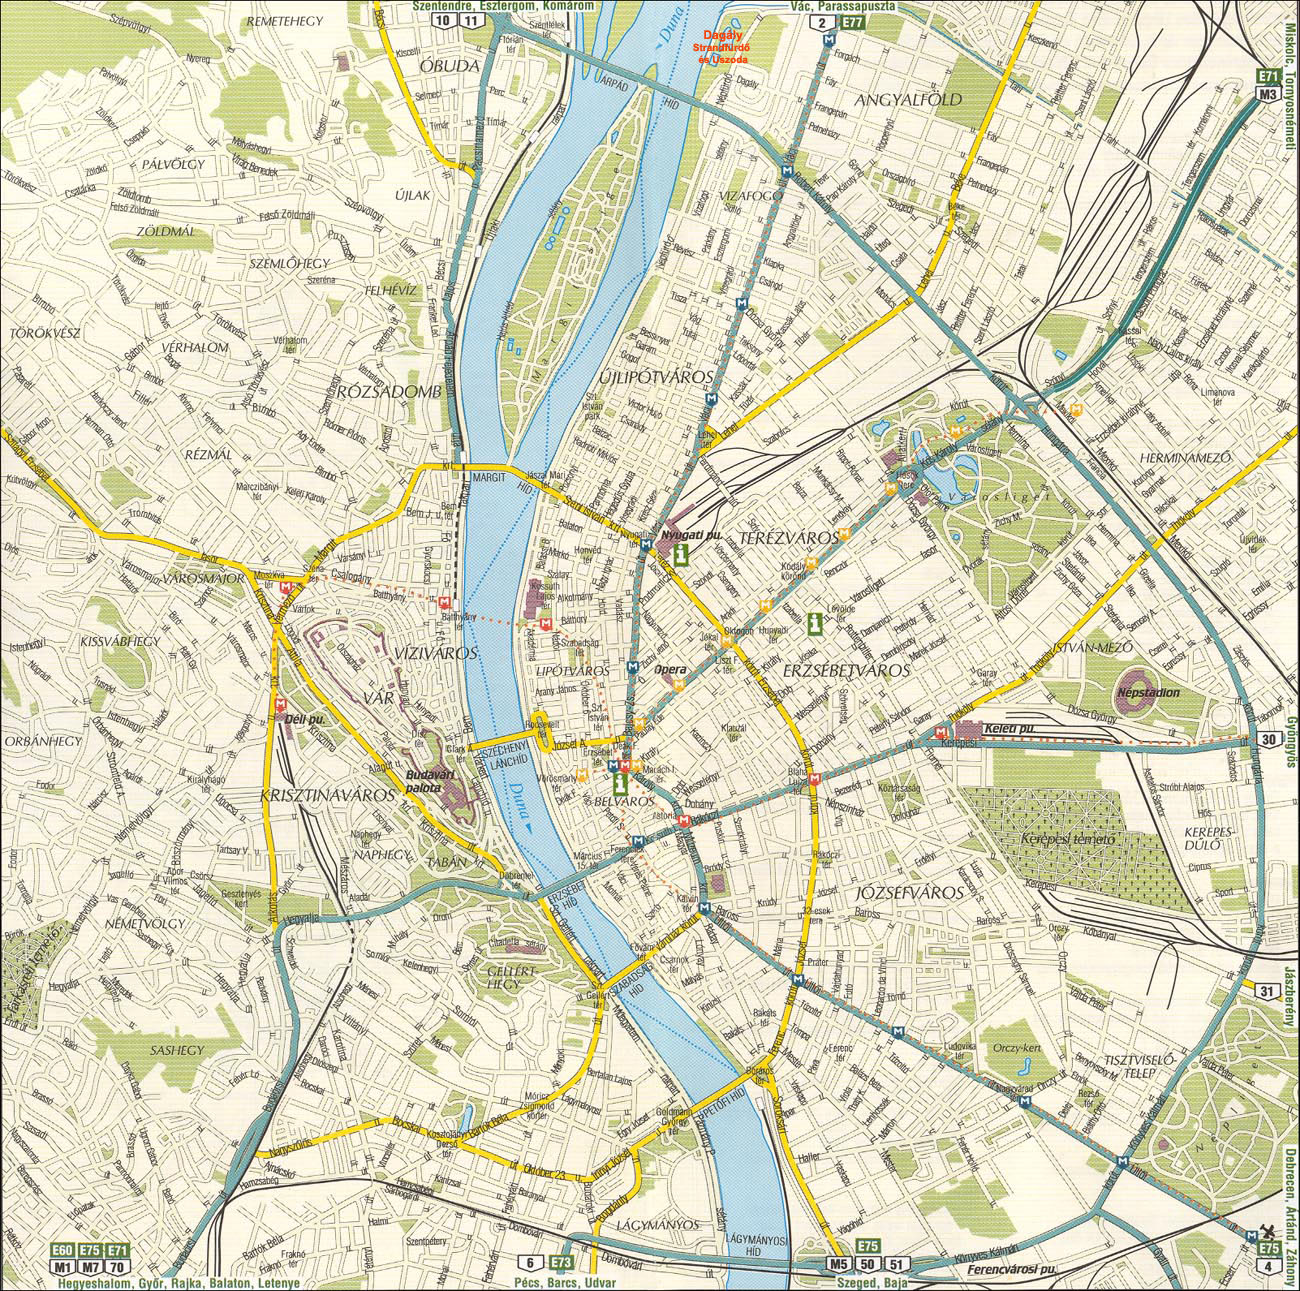 karta budapest Continent Holiday & Travel karta budapest